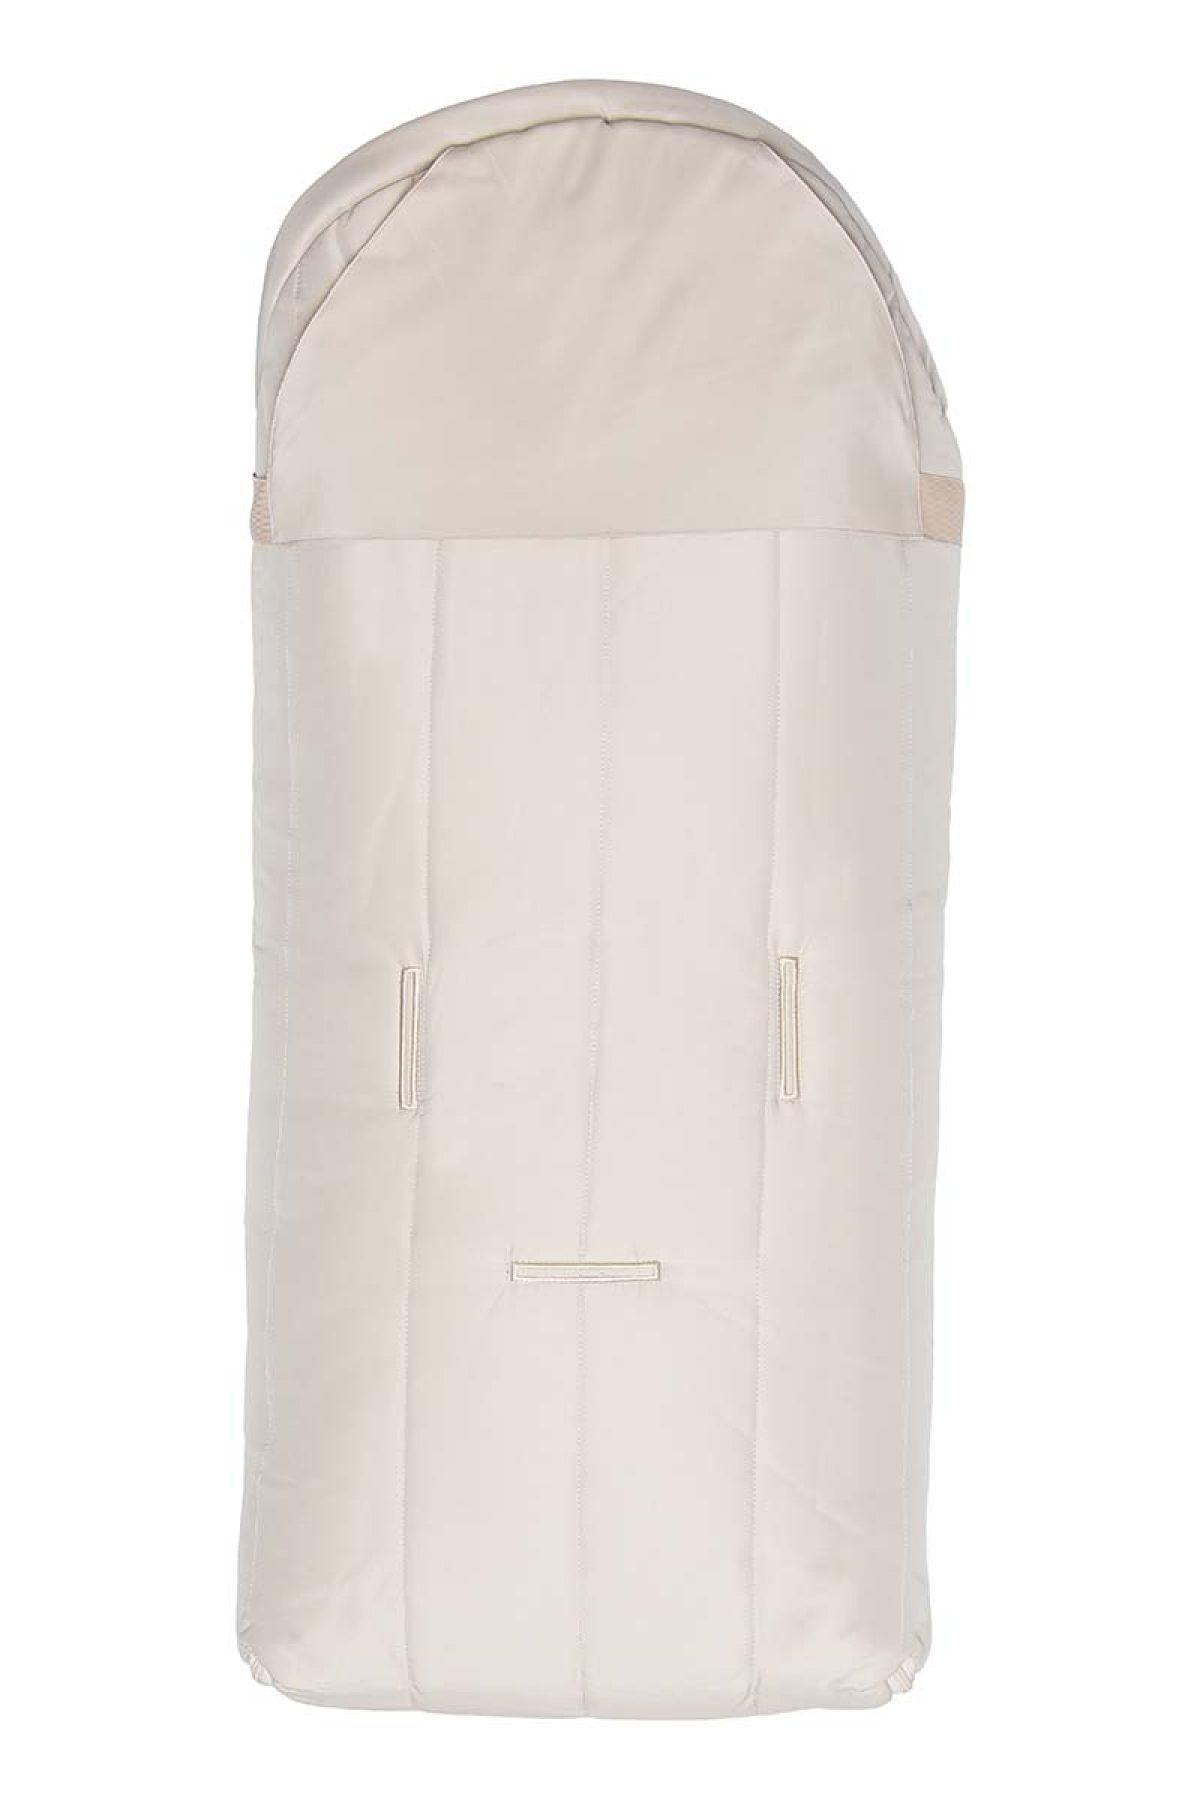 Sheepy Care Zippered Baby Sleeping Bag  MDK013 Beige